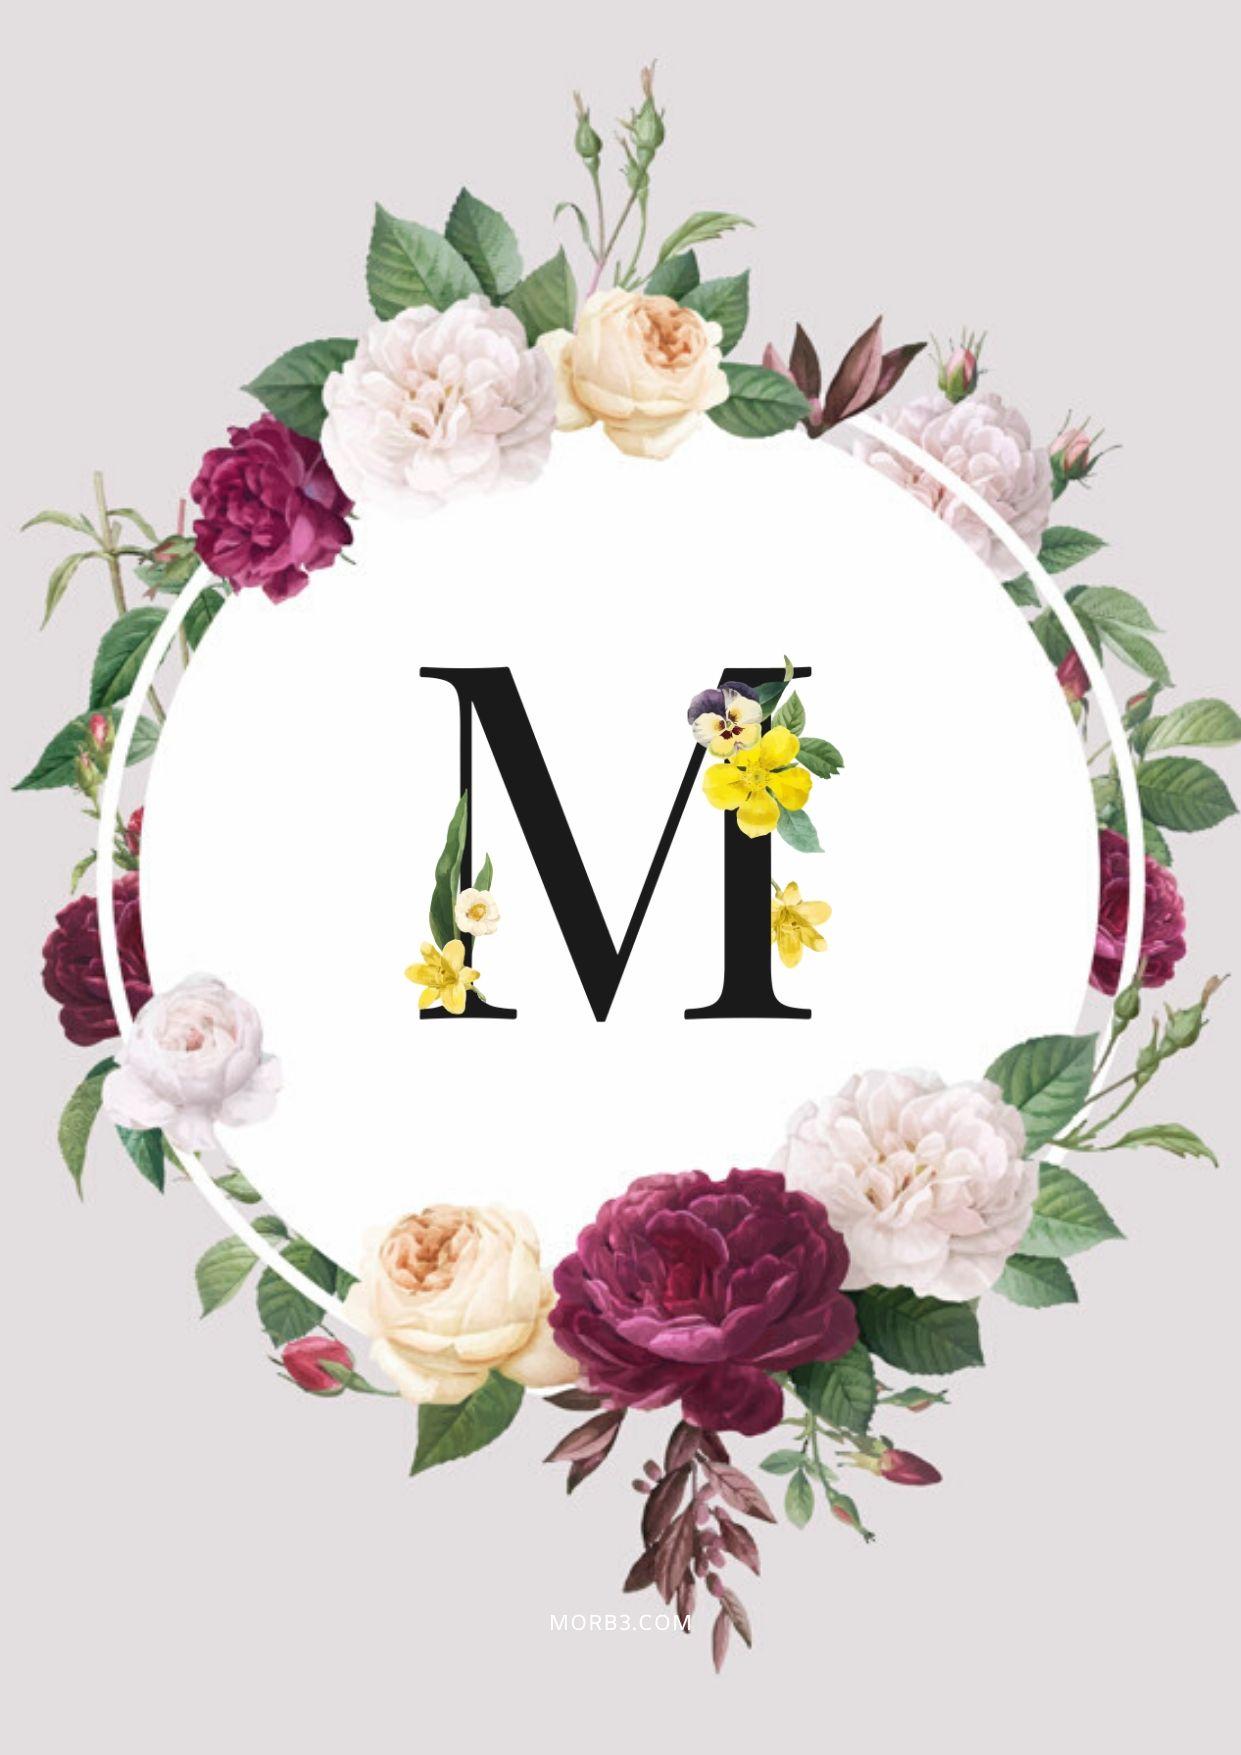 صور حروف M بالورود وملونة